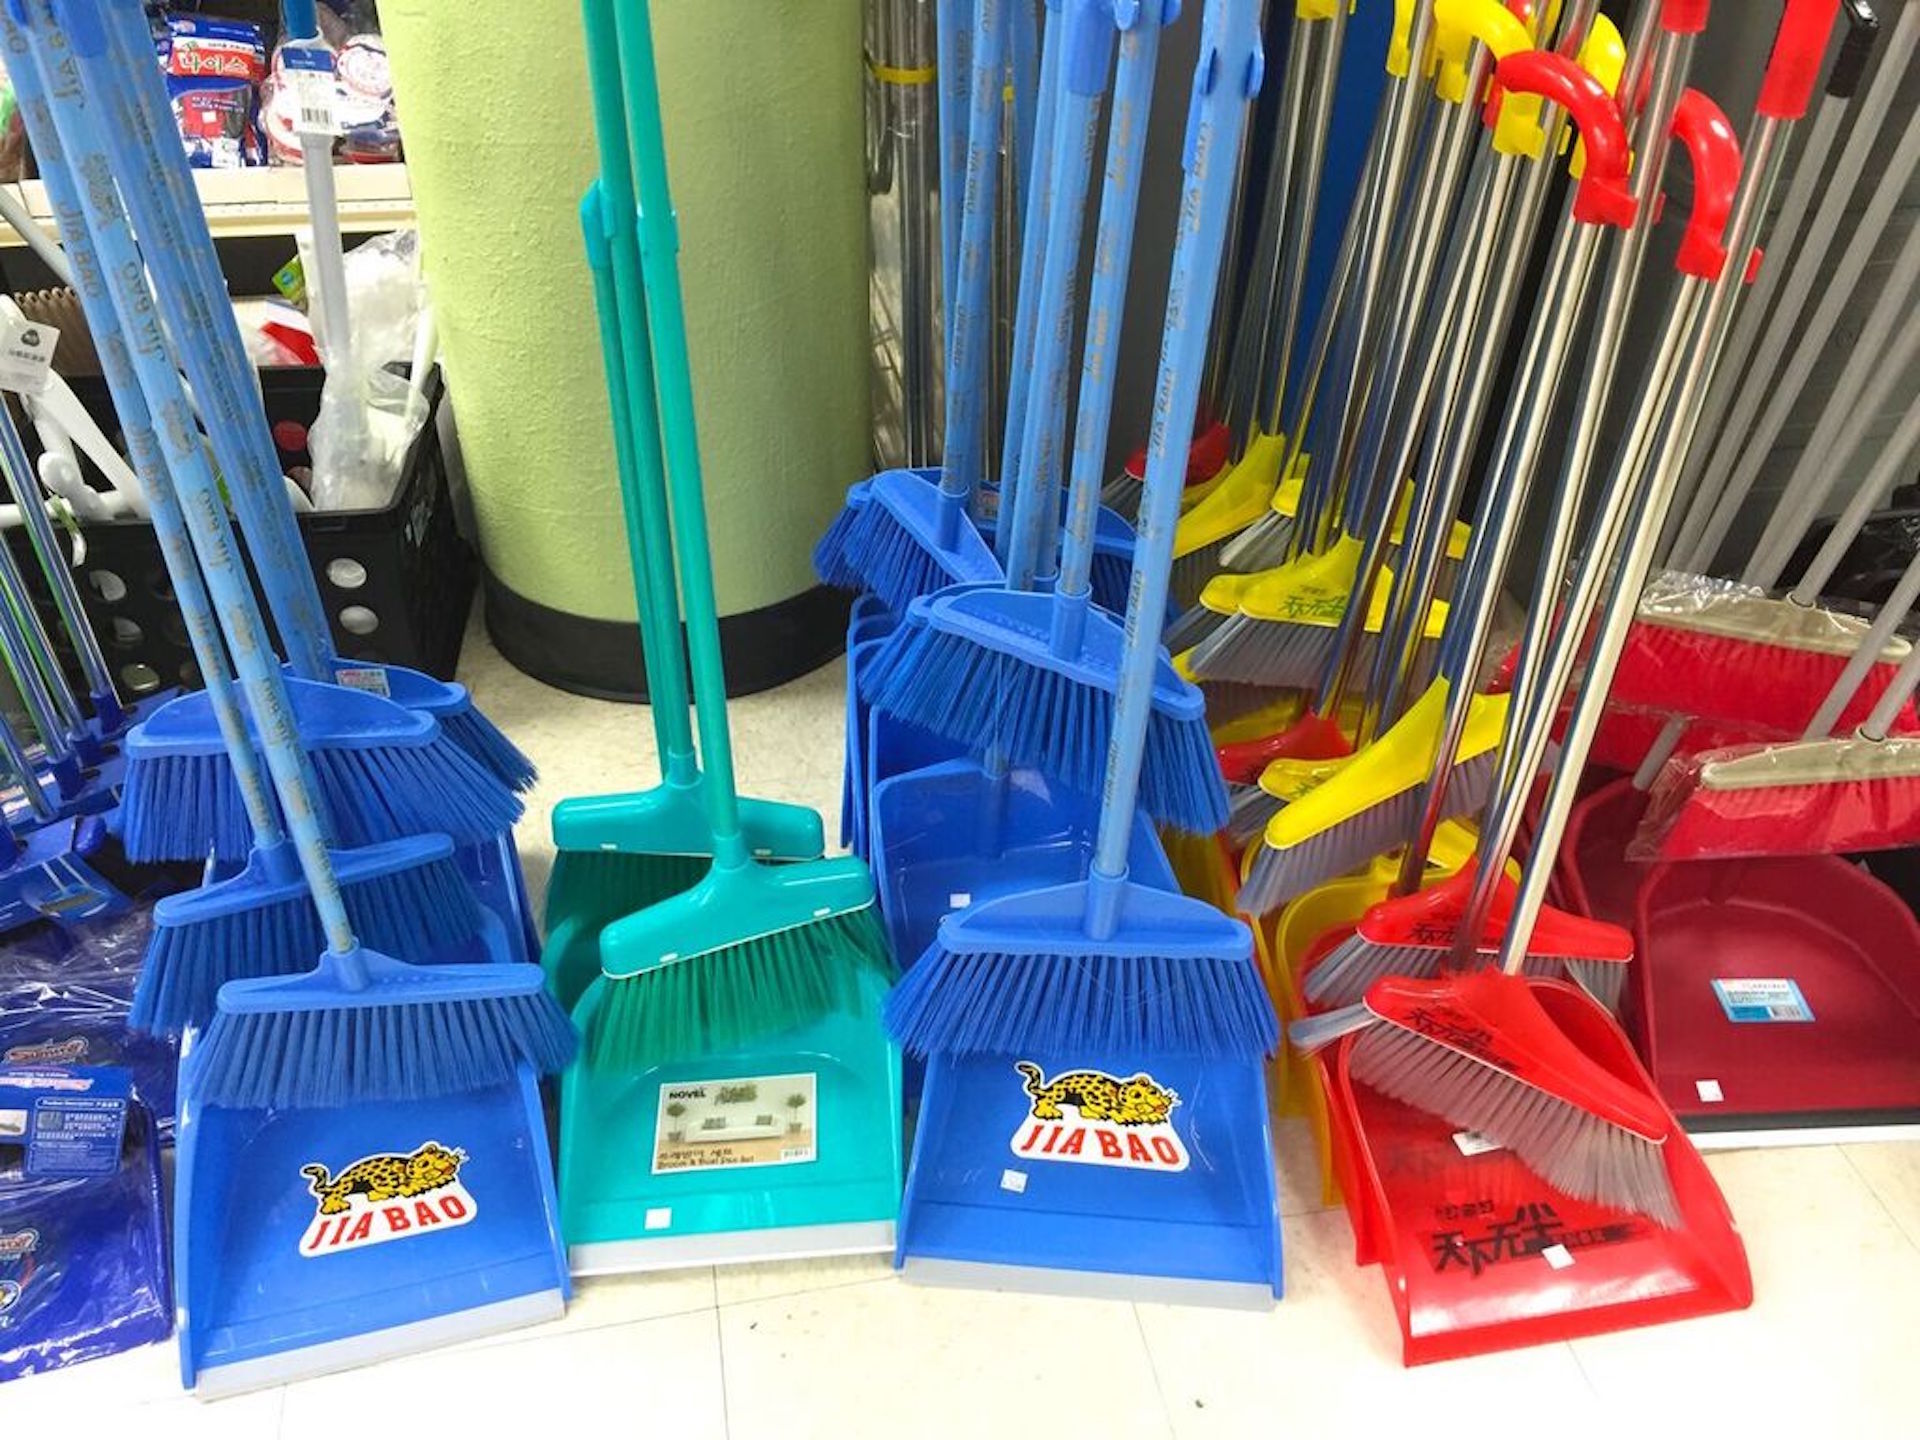 Sweep away last year's bad luck